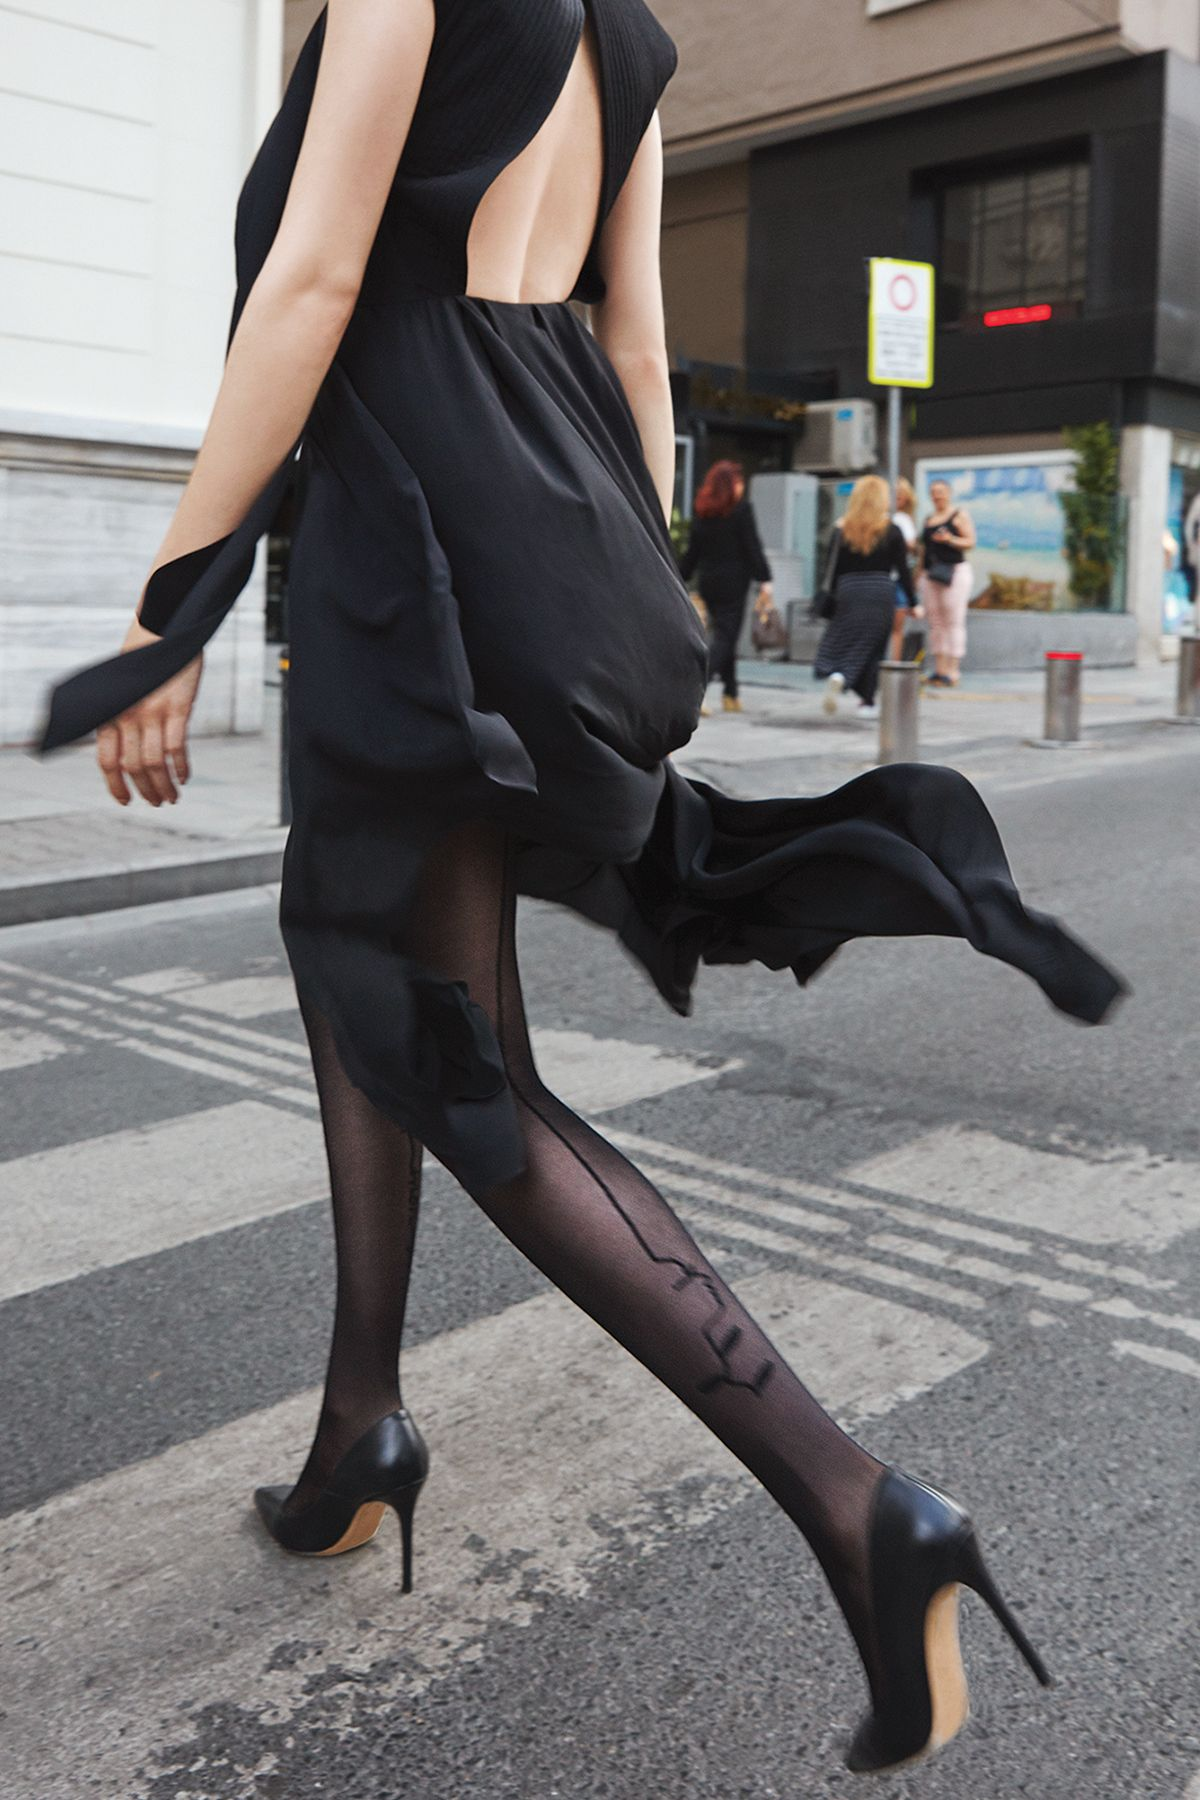 89ea707d075a1 Siyah Dreams Külotlu Çorap | Kadın giyim sx | Taytlar, Siyah ...